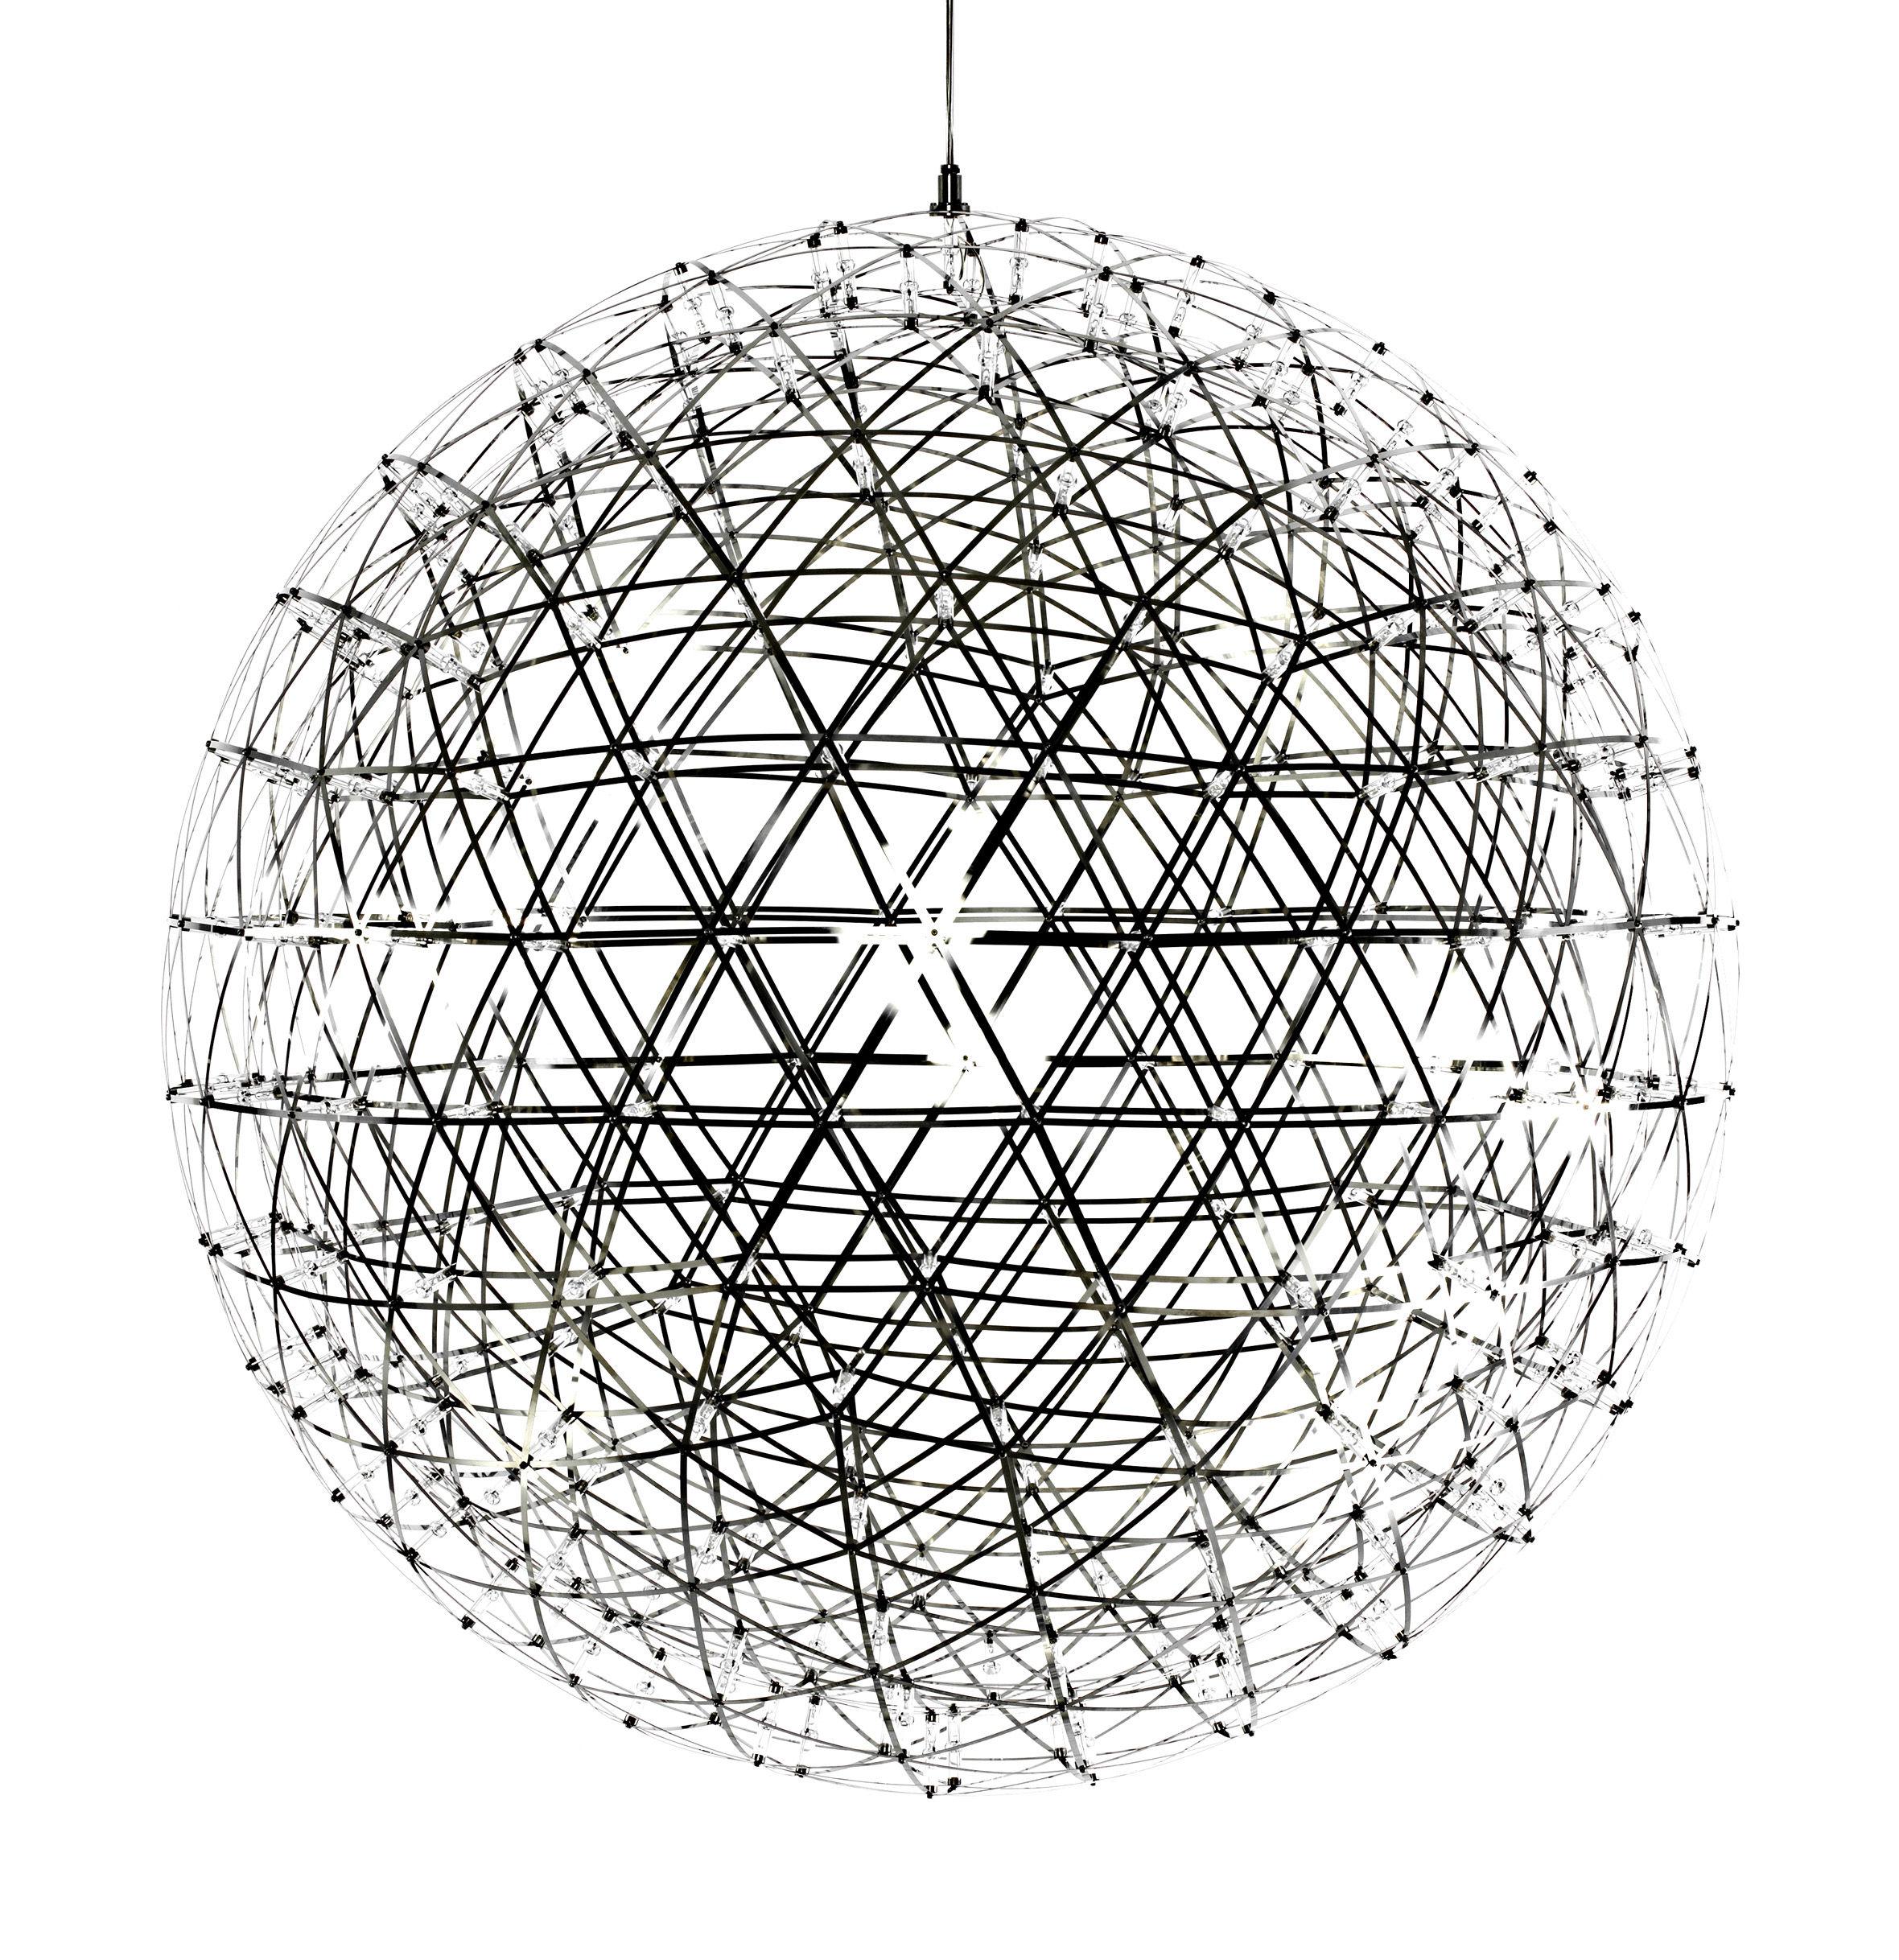 Luminaire - Suspensions - Suspension Raimond LED / Ø 127 cm - Moooi - Ø 127 cm - Acier poli - Acier inoxydable, Aluminium, PMMA